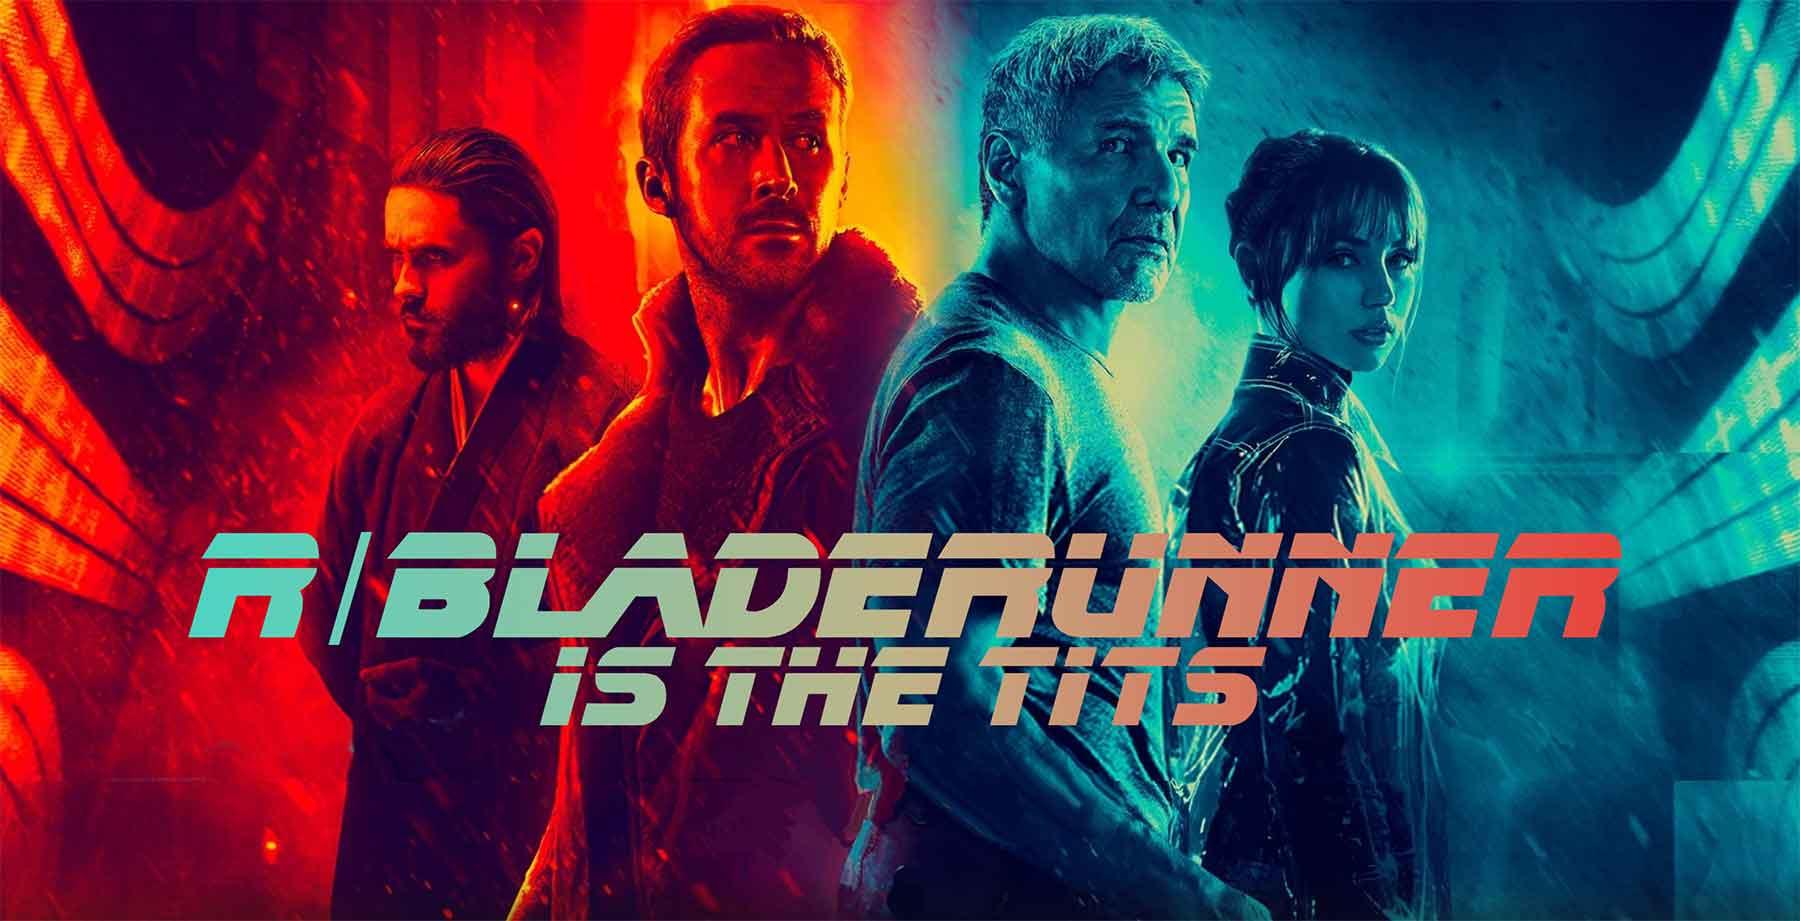 Bladerunner poster